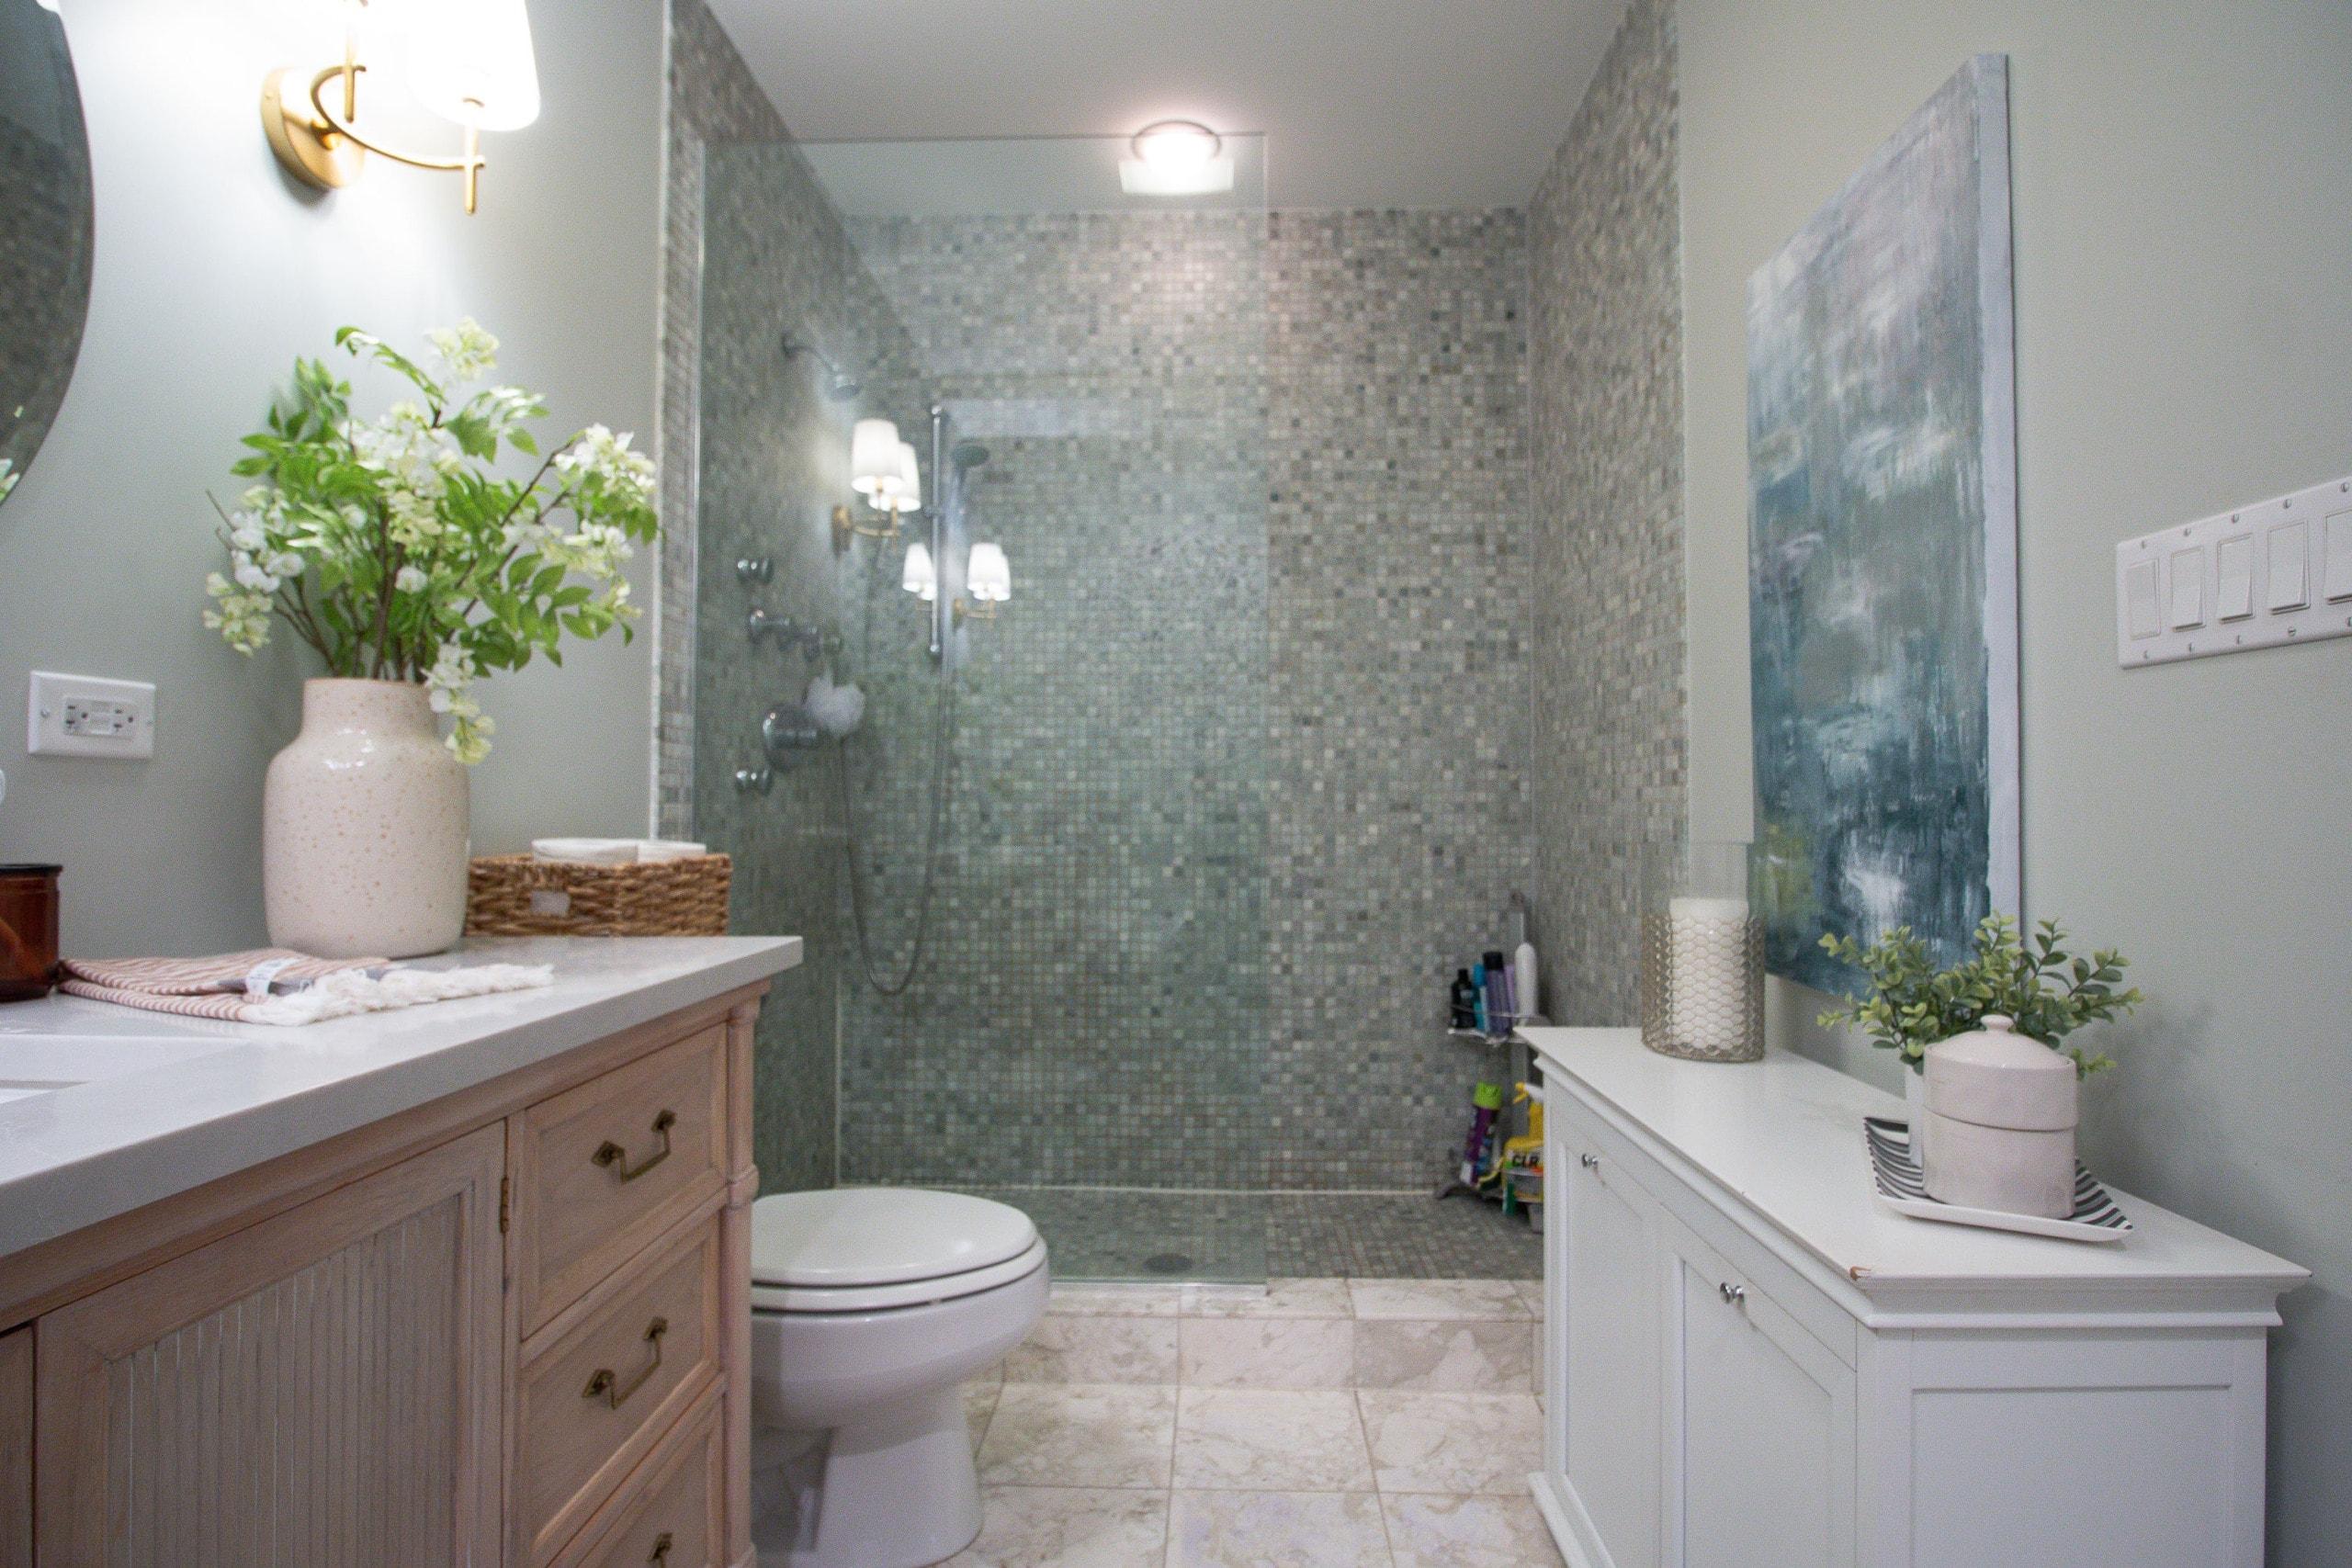 Main bathroom ready for demo